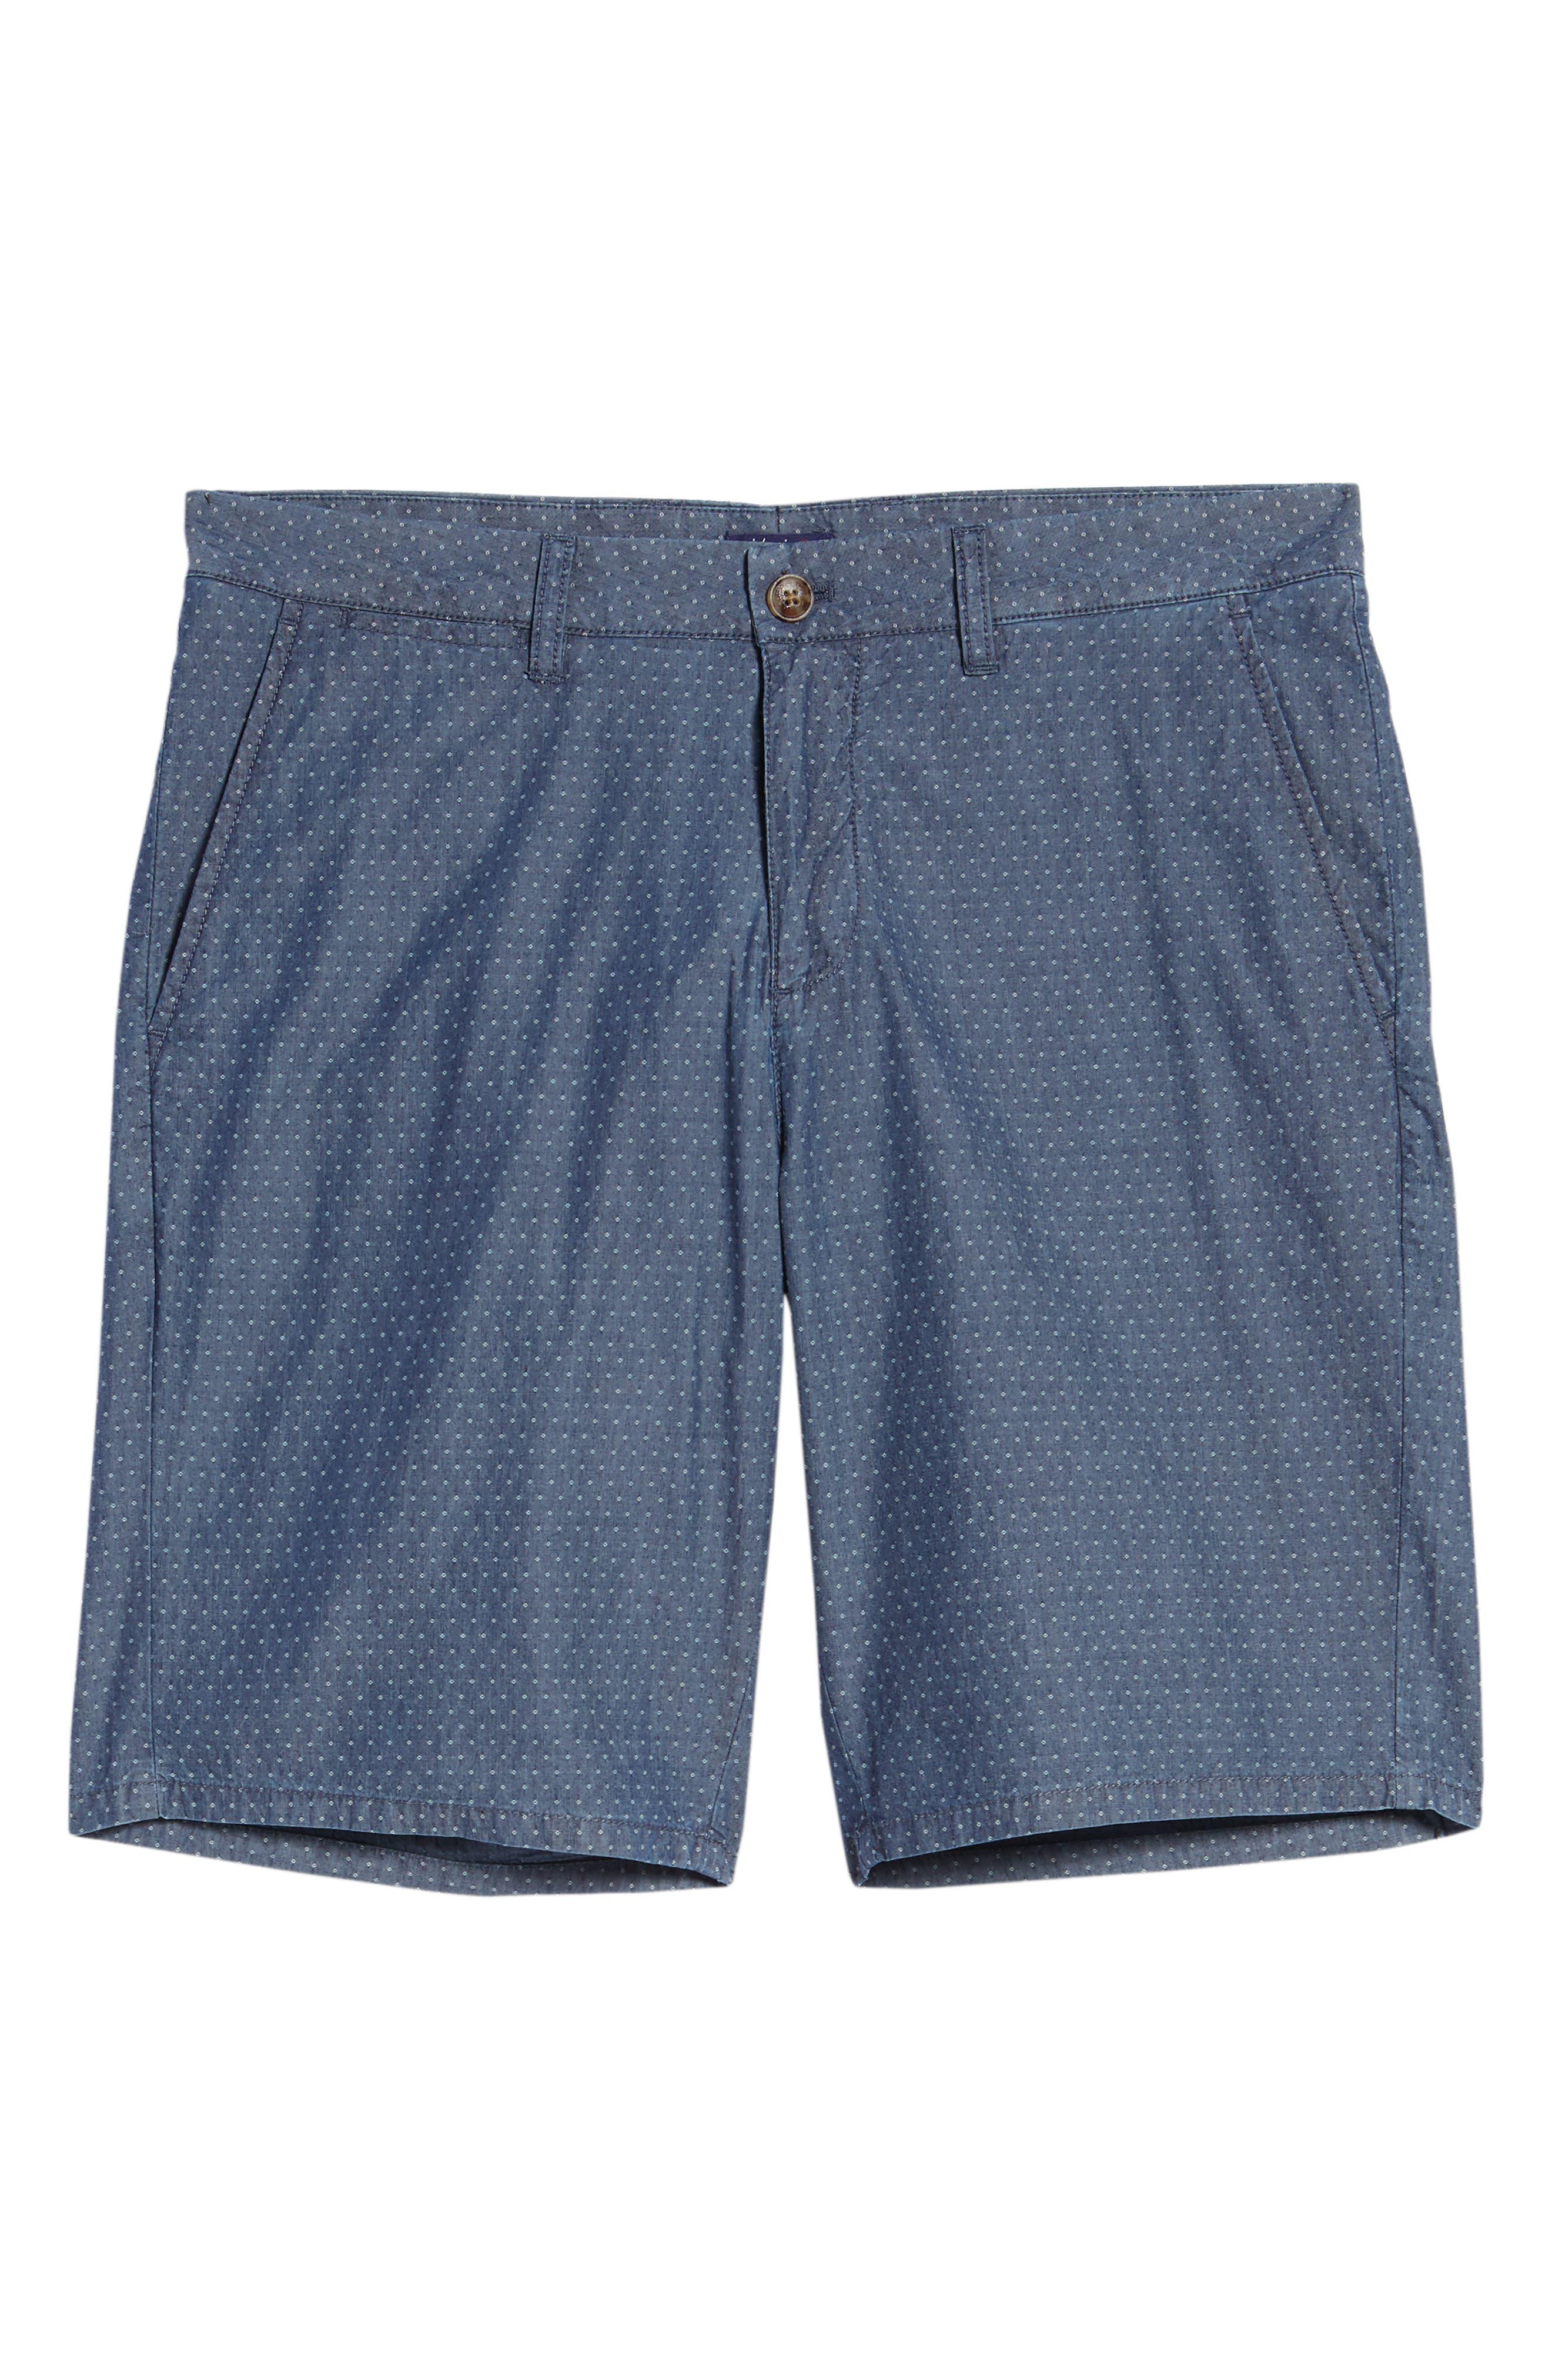 Oliver Classic Fit Chambray Jacquard Shorts,                             Alternate thumbnail 6, color,                             400